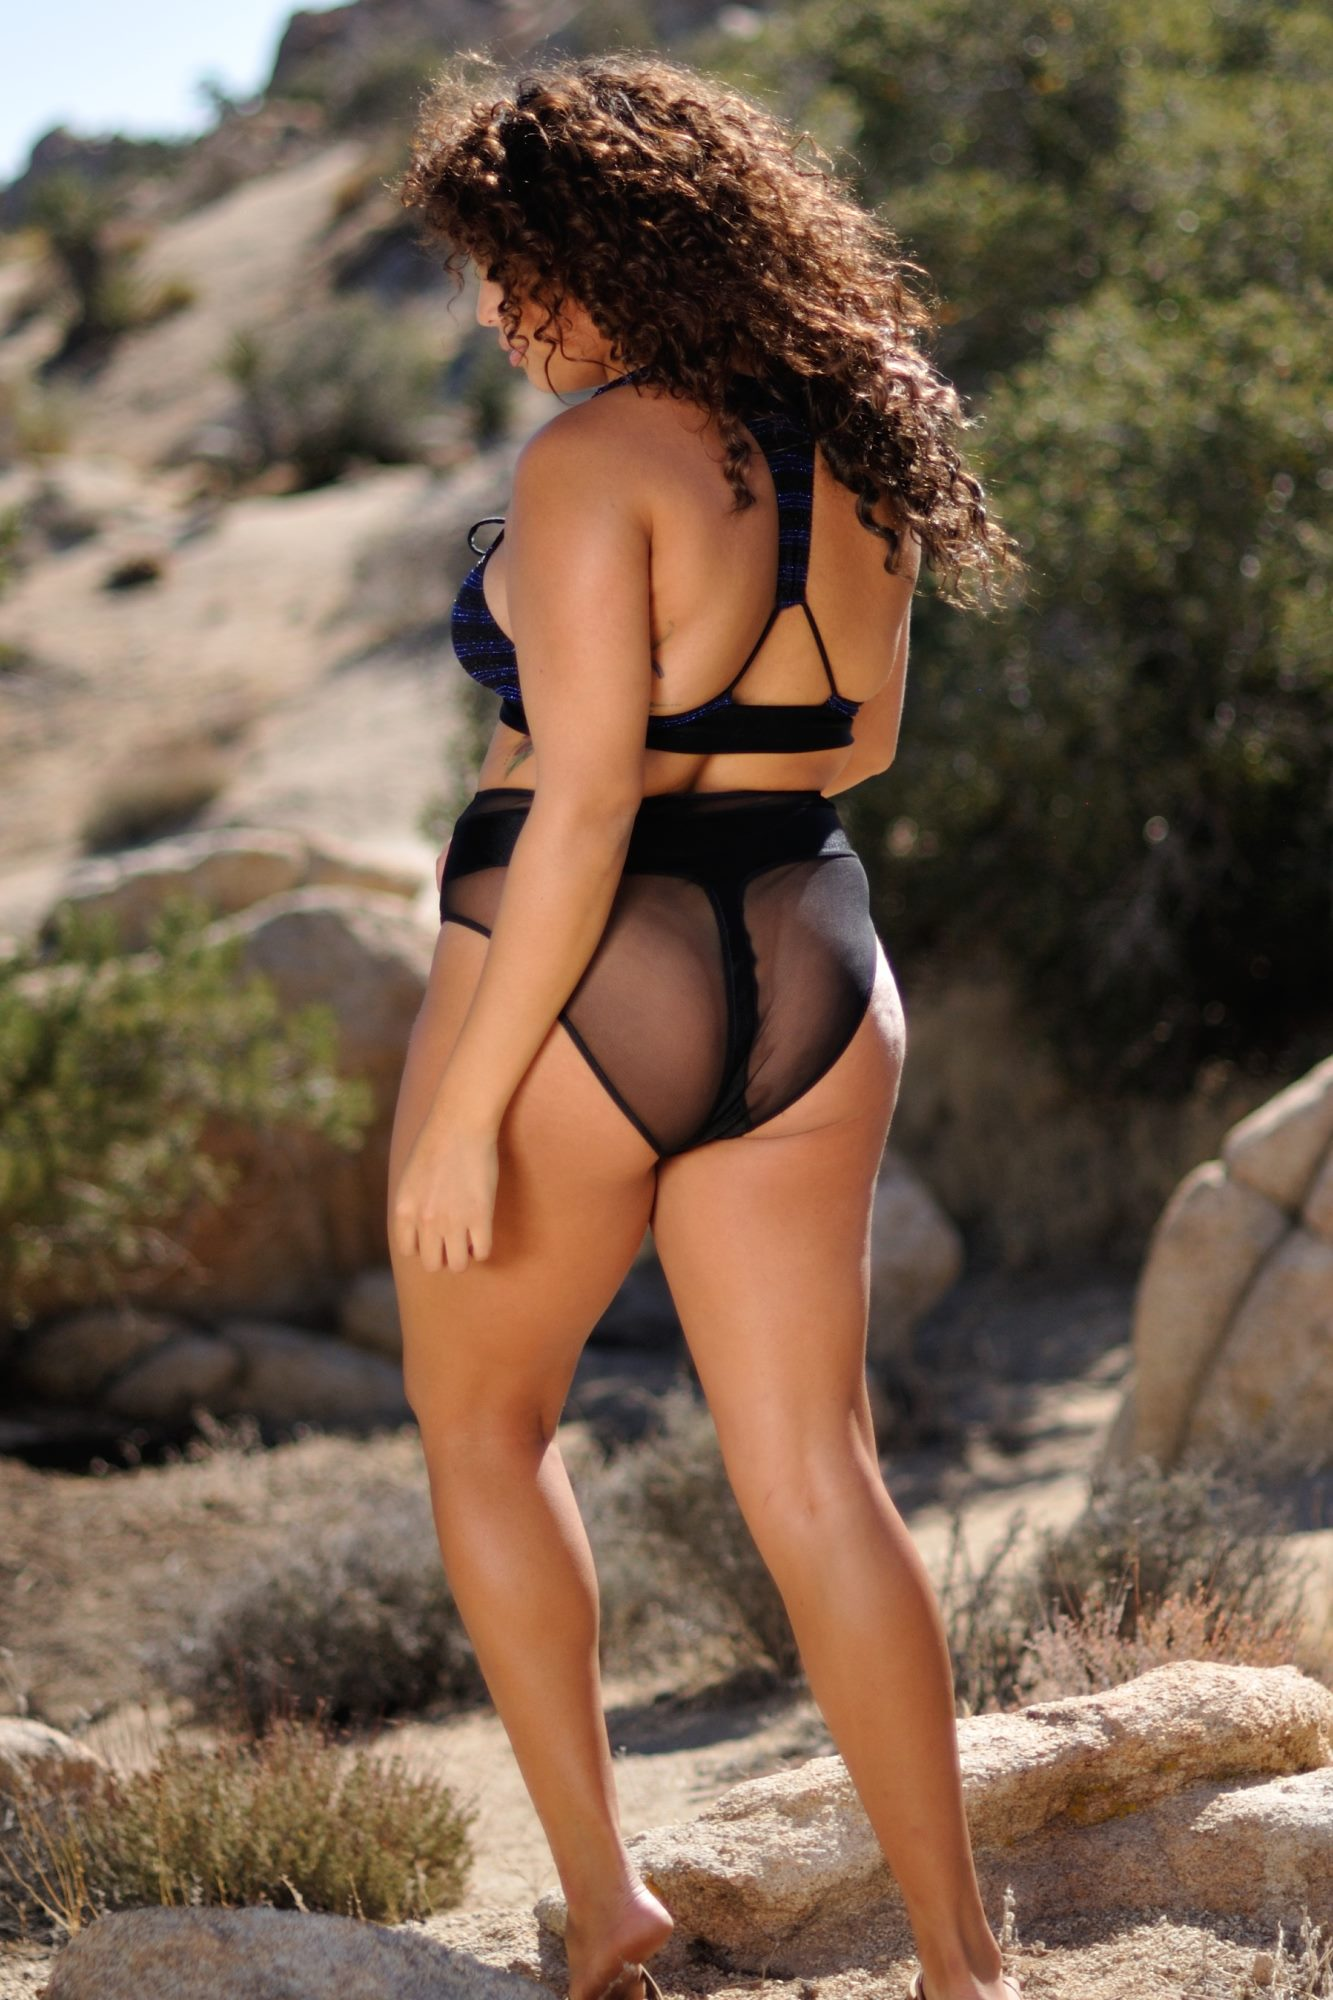 fdc98b41c4c80 High Waist Faux Thong Bottom. Lace Up Bikini top with Faux thong bikini  bottom back. The Royal sheer women's bikini swimsuit by brigitewear with  cheeky ...